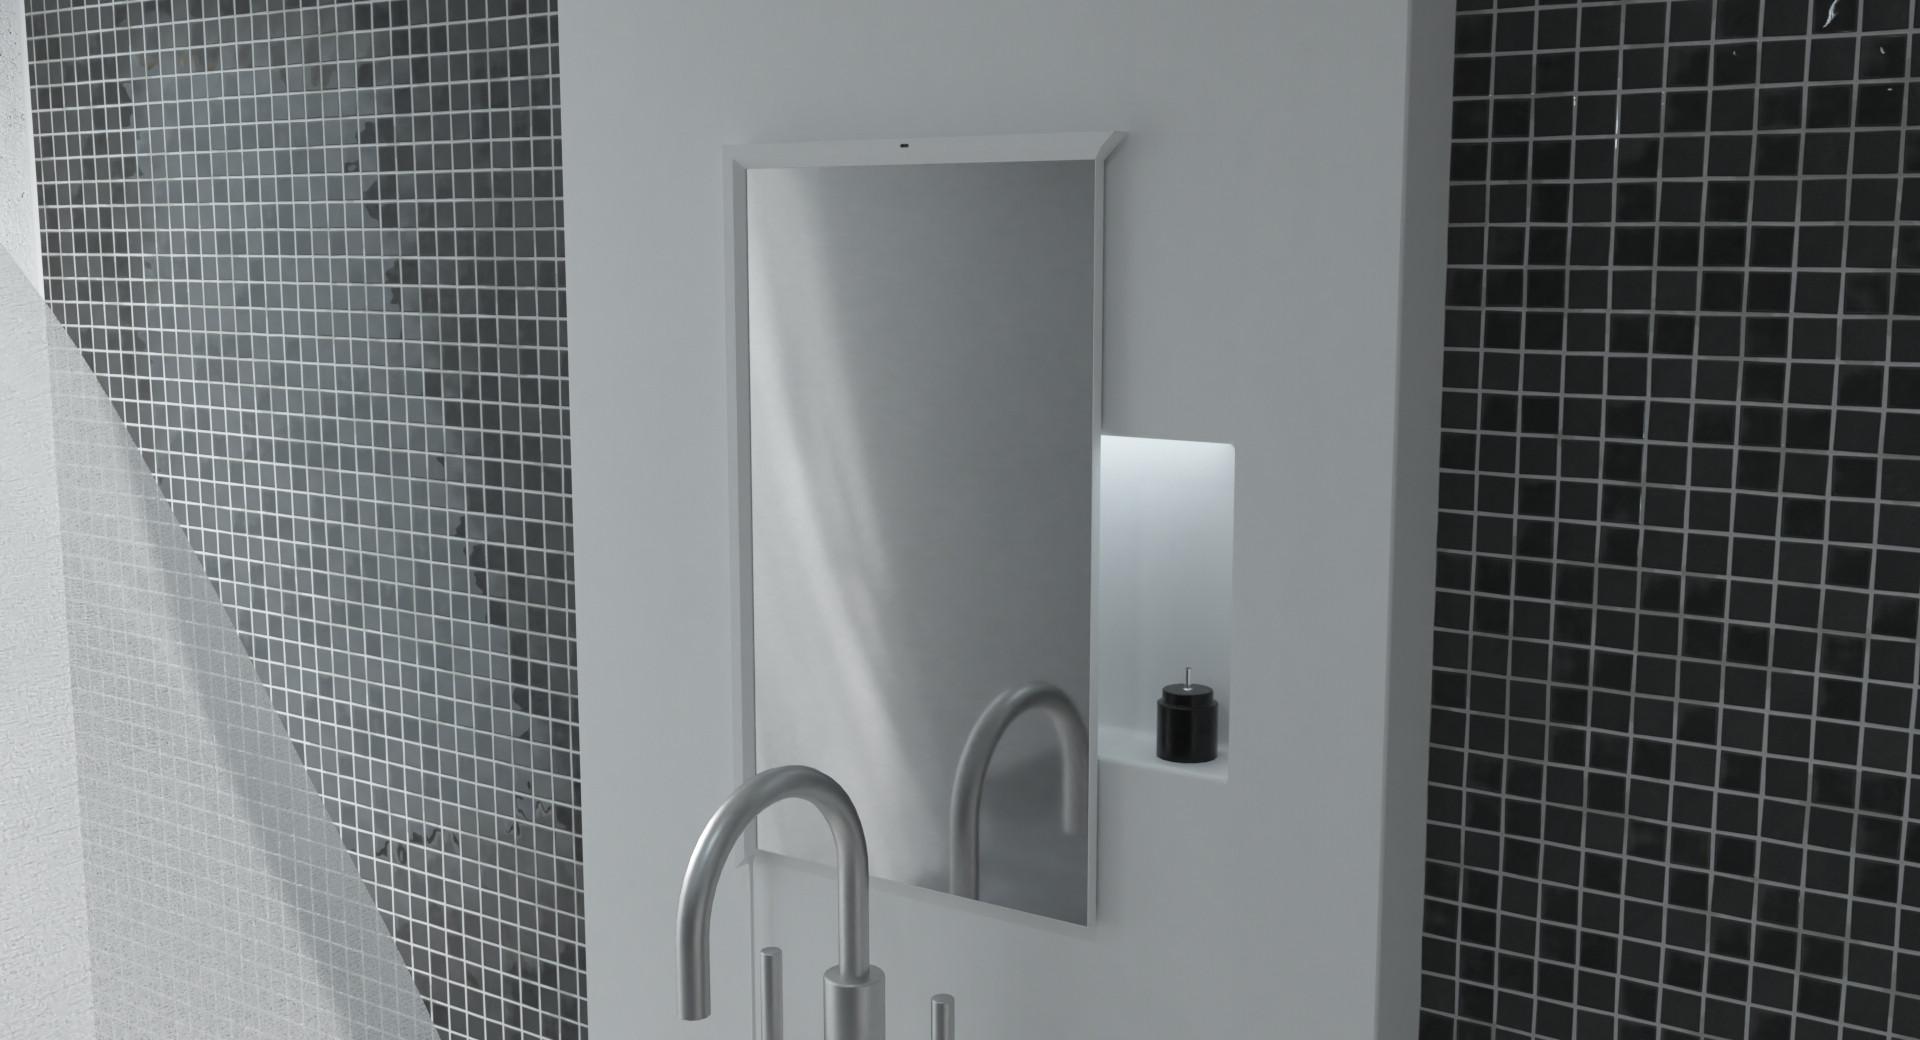 Bathtub Render Channel Art0050.jpg